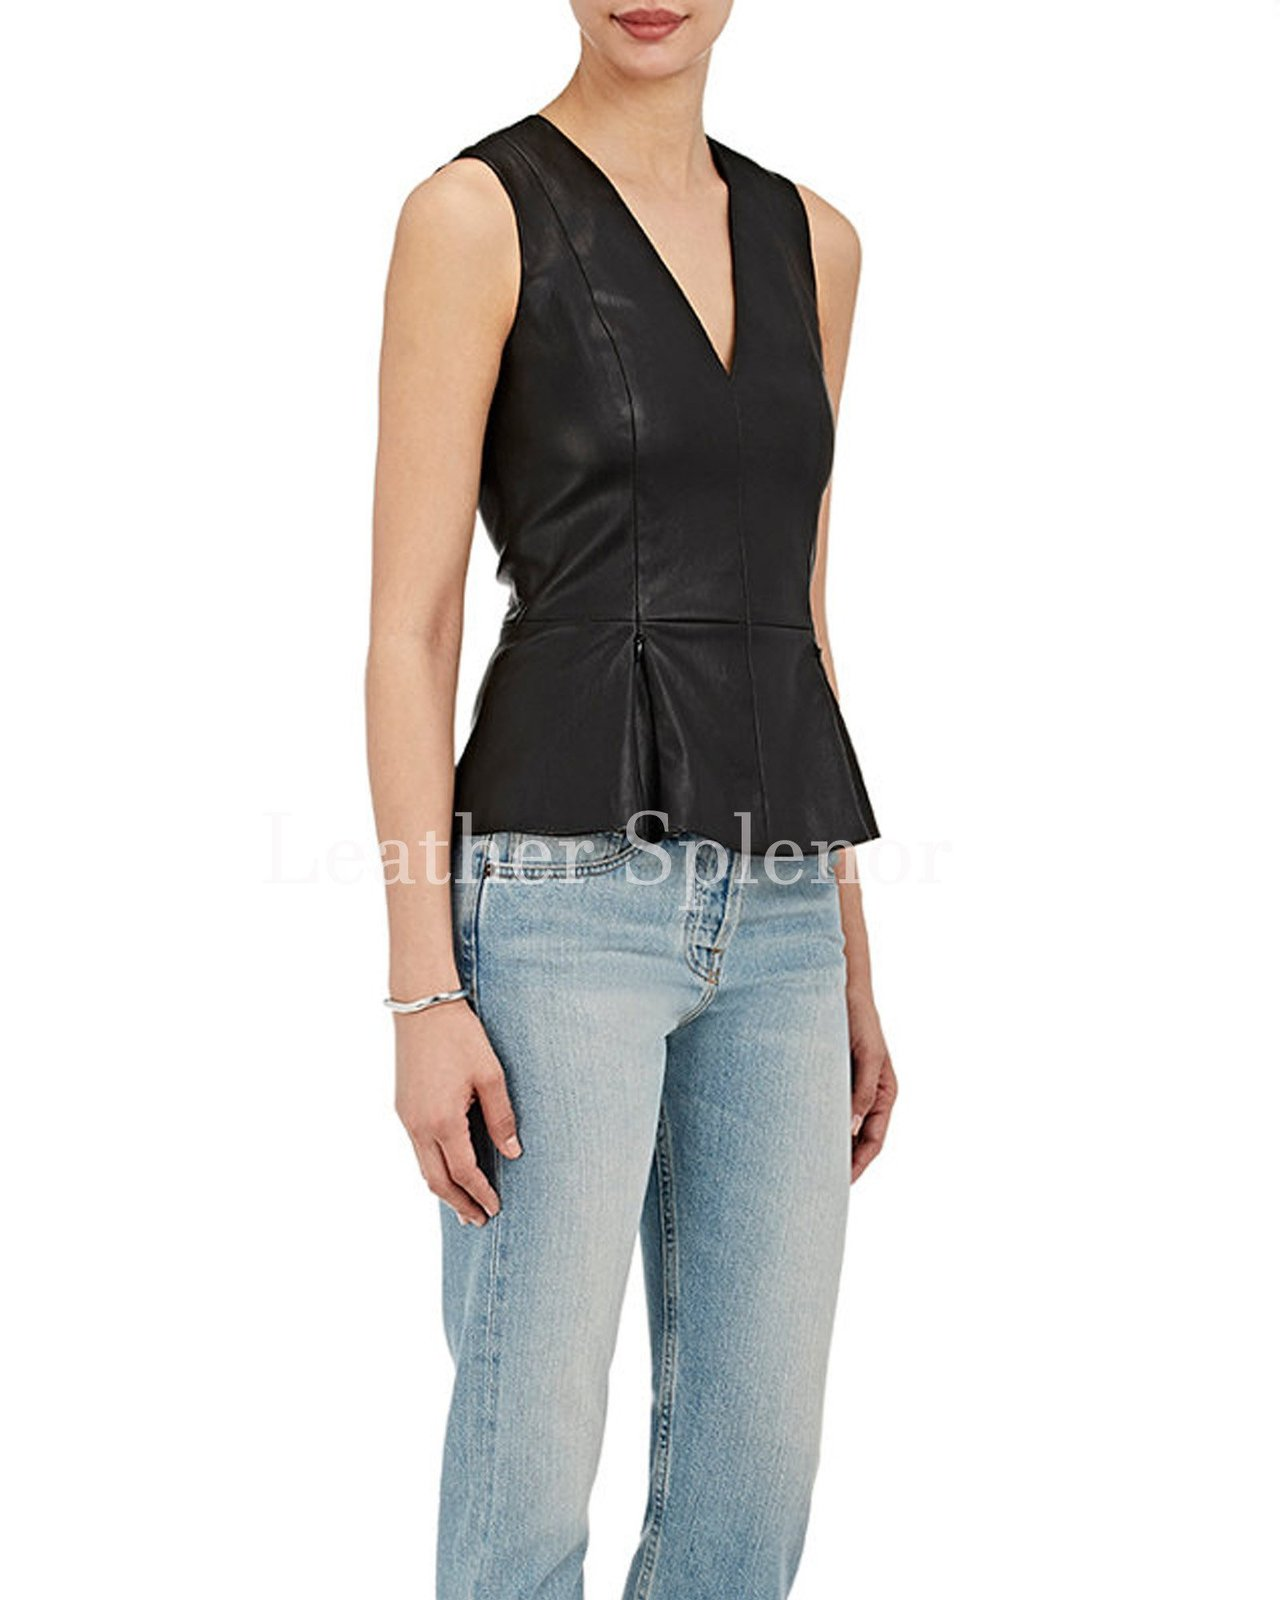 V Neck Sleeveless Women Pleated Peplum Leather Top